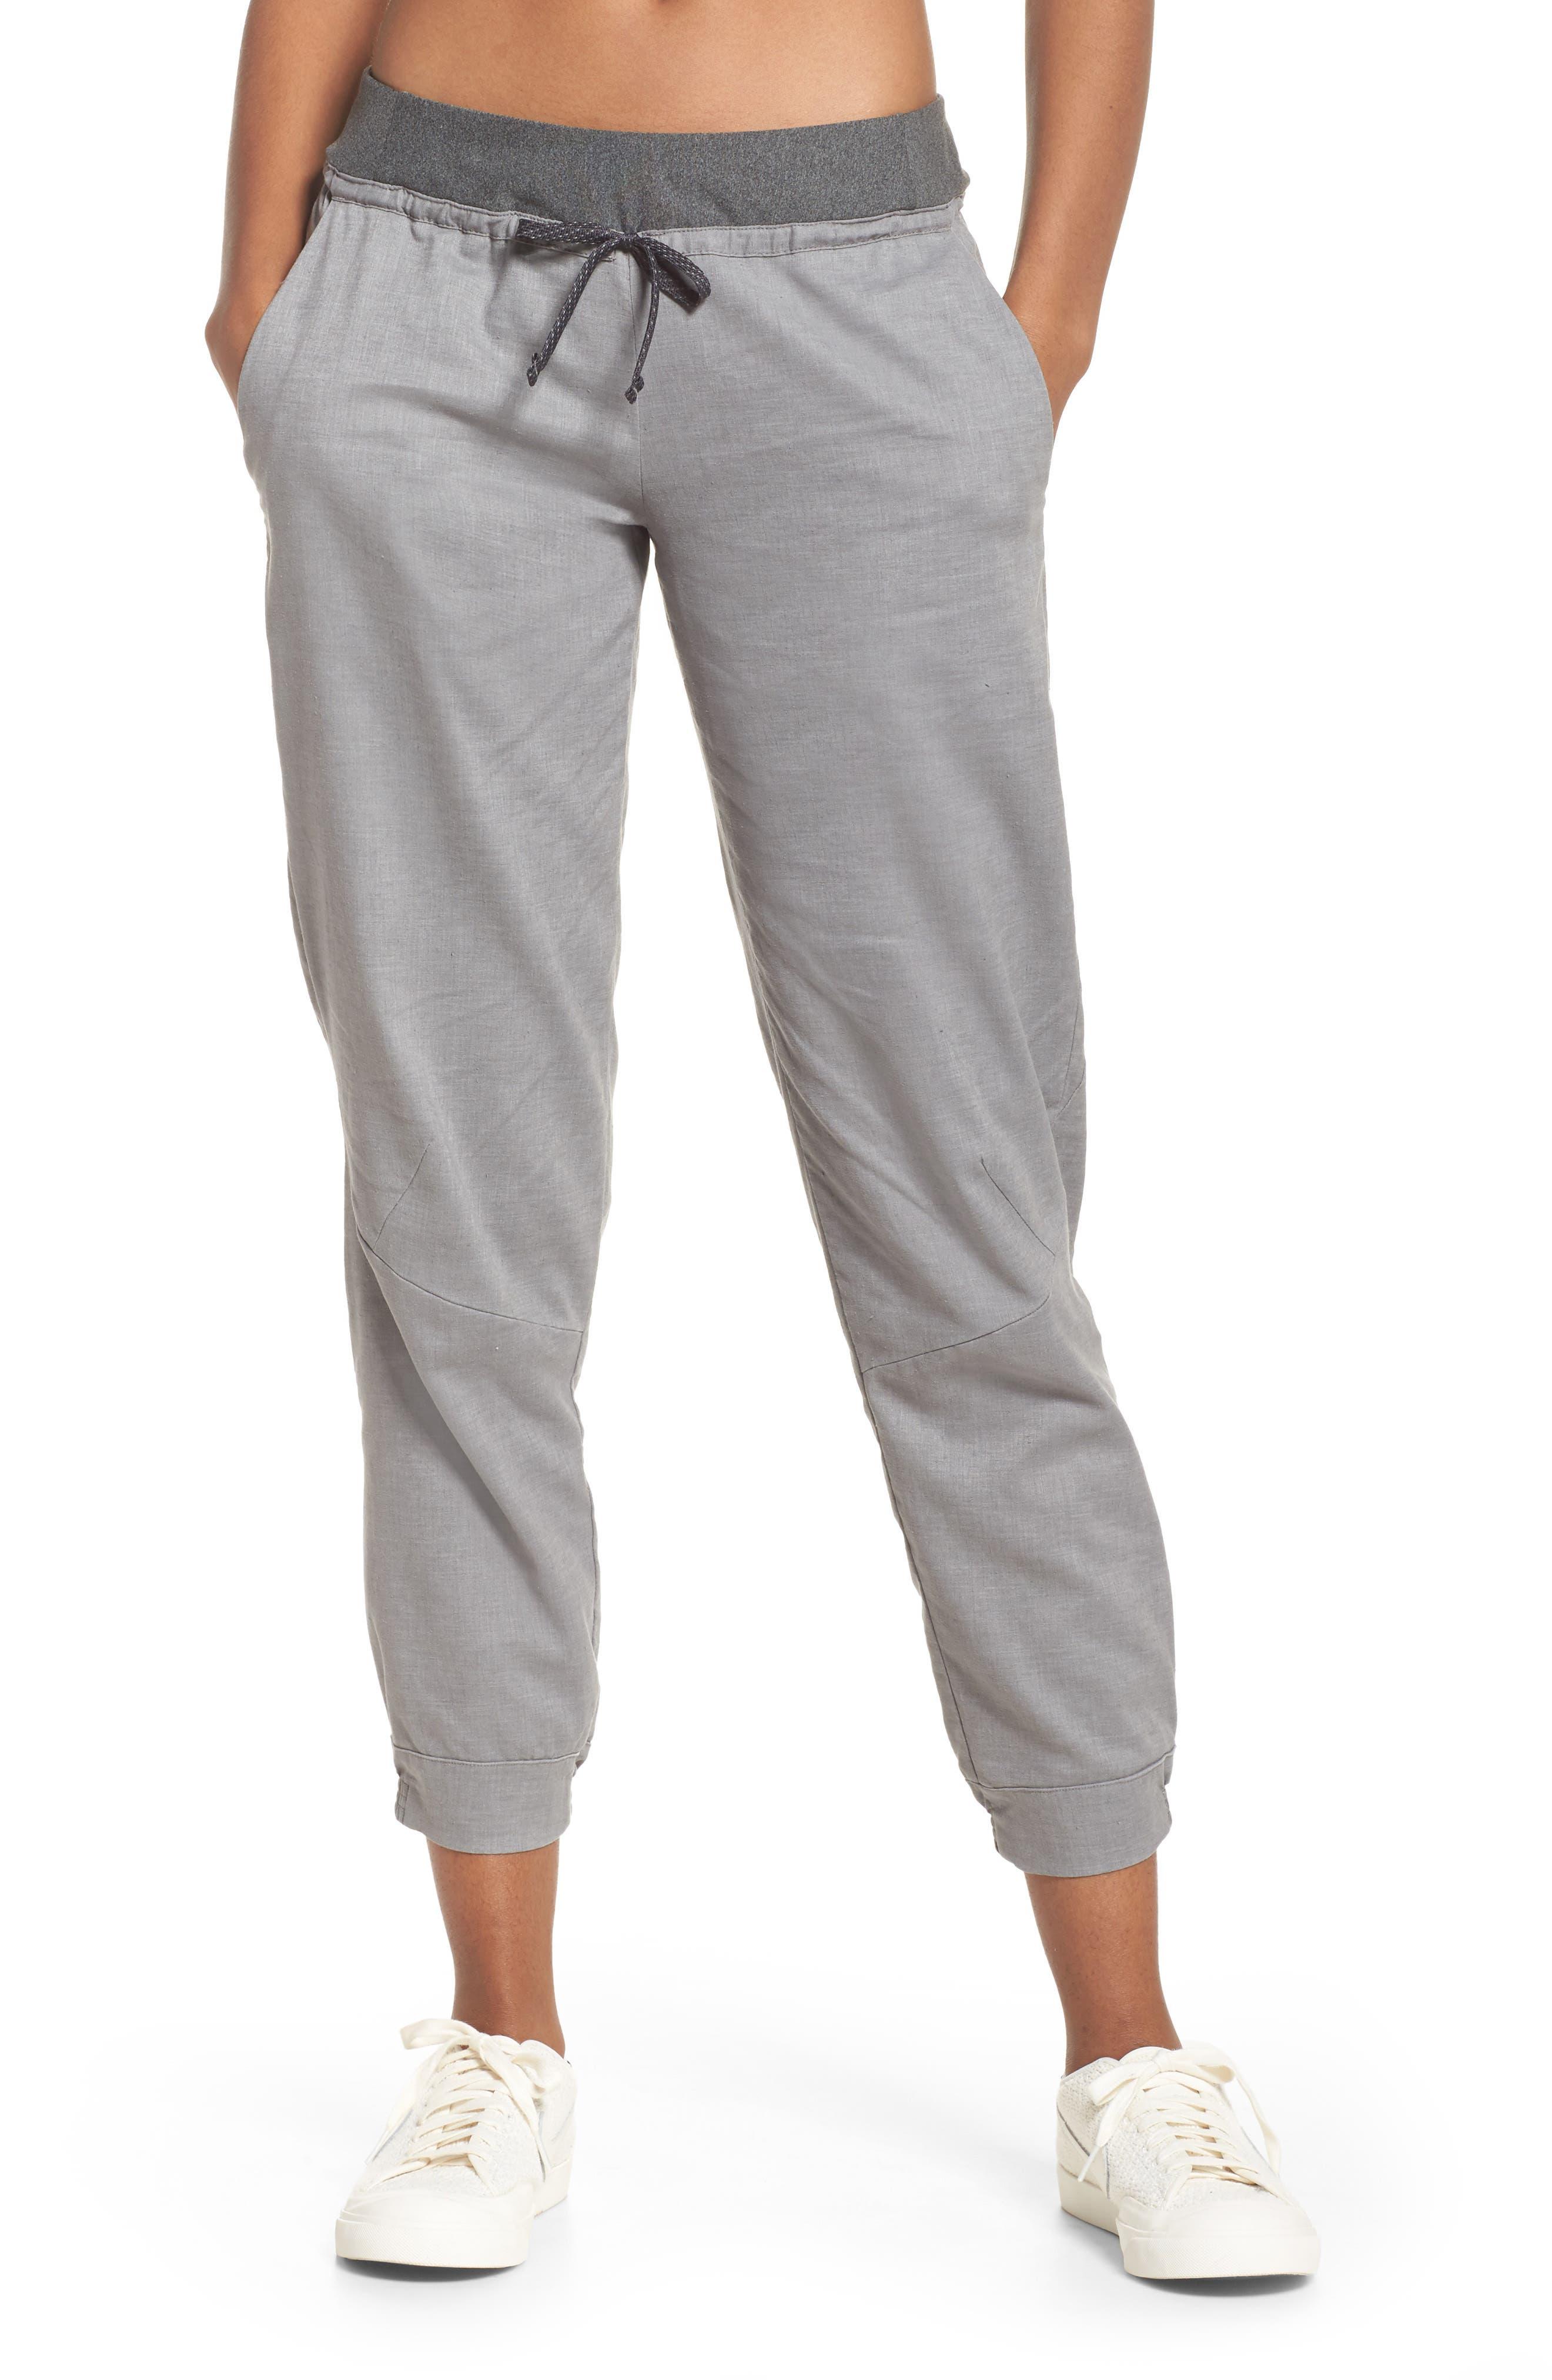 PATAGONIA Women's Hampi Rock Pants, Main, color, FEATHER GREY